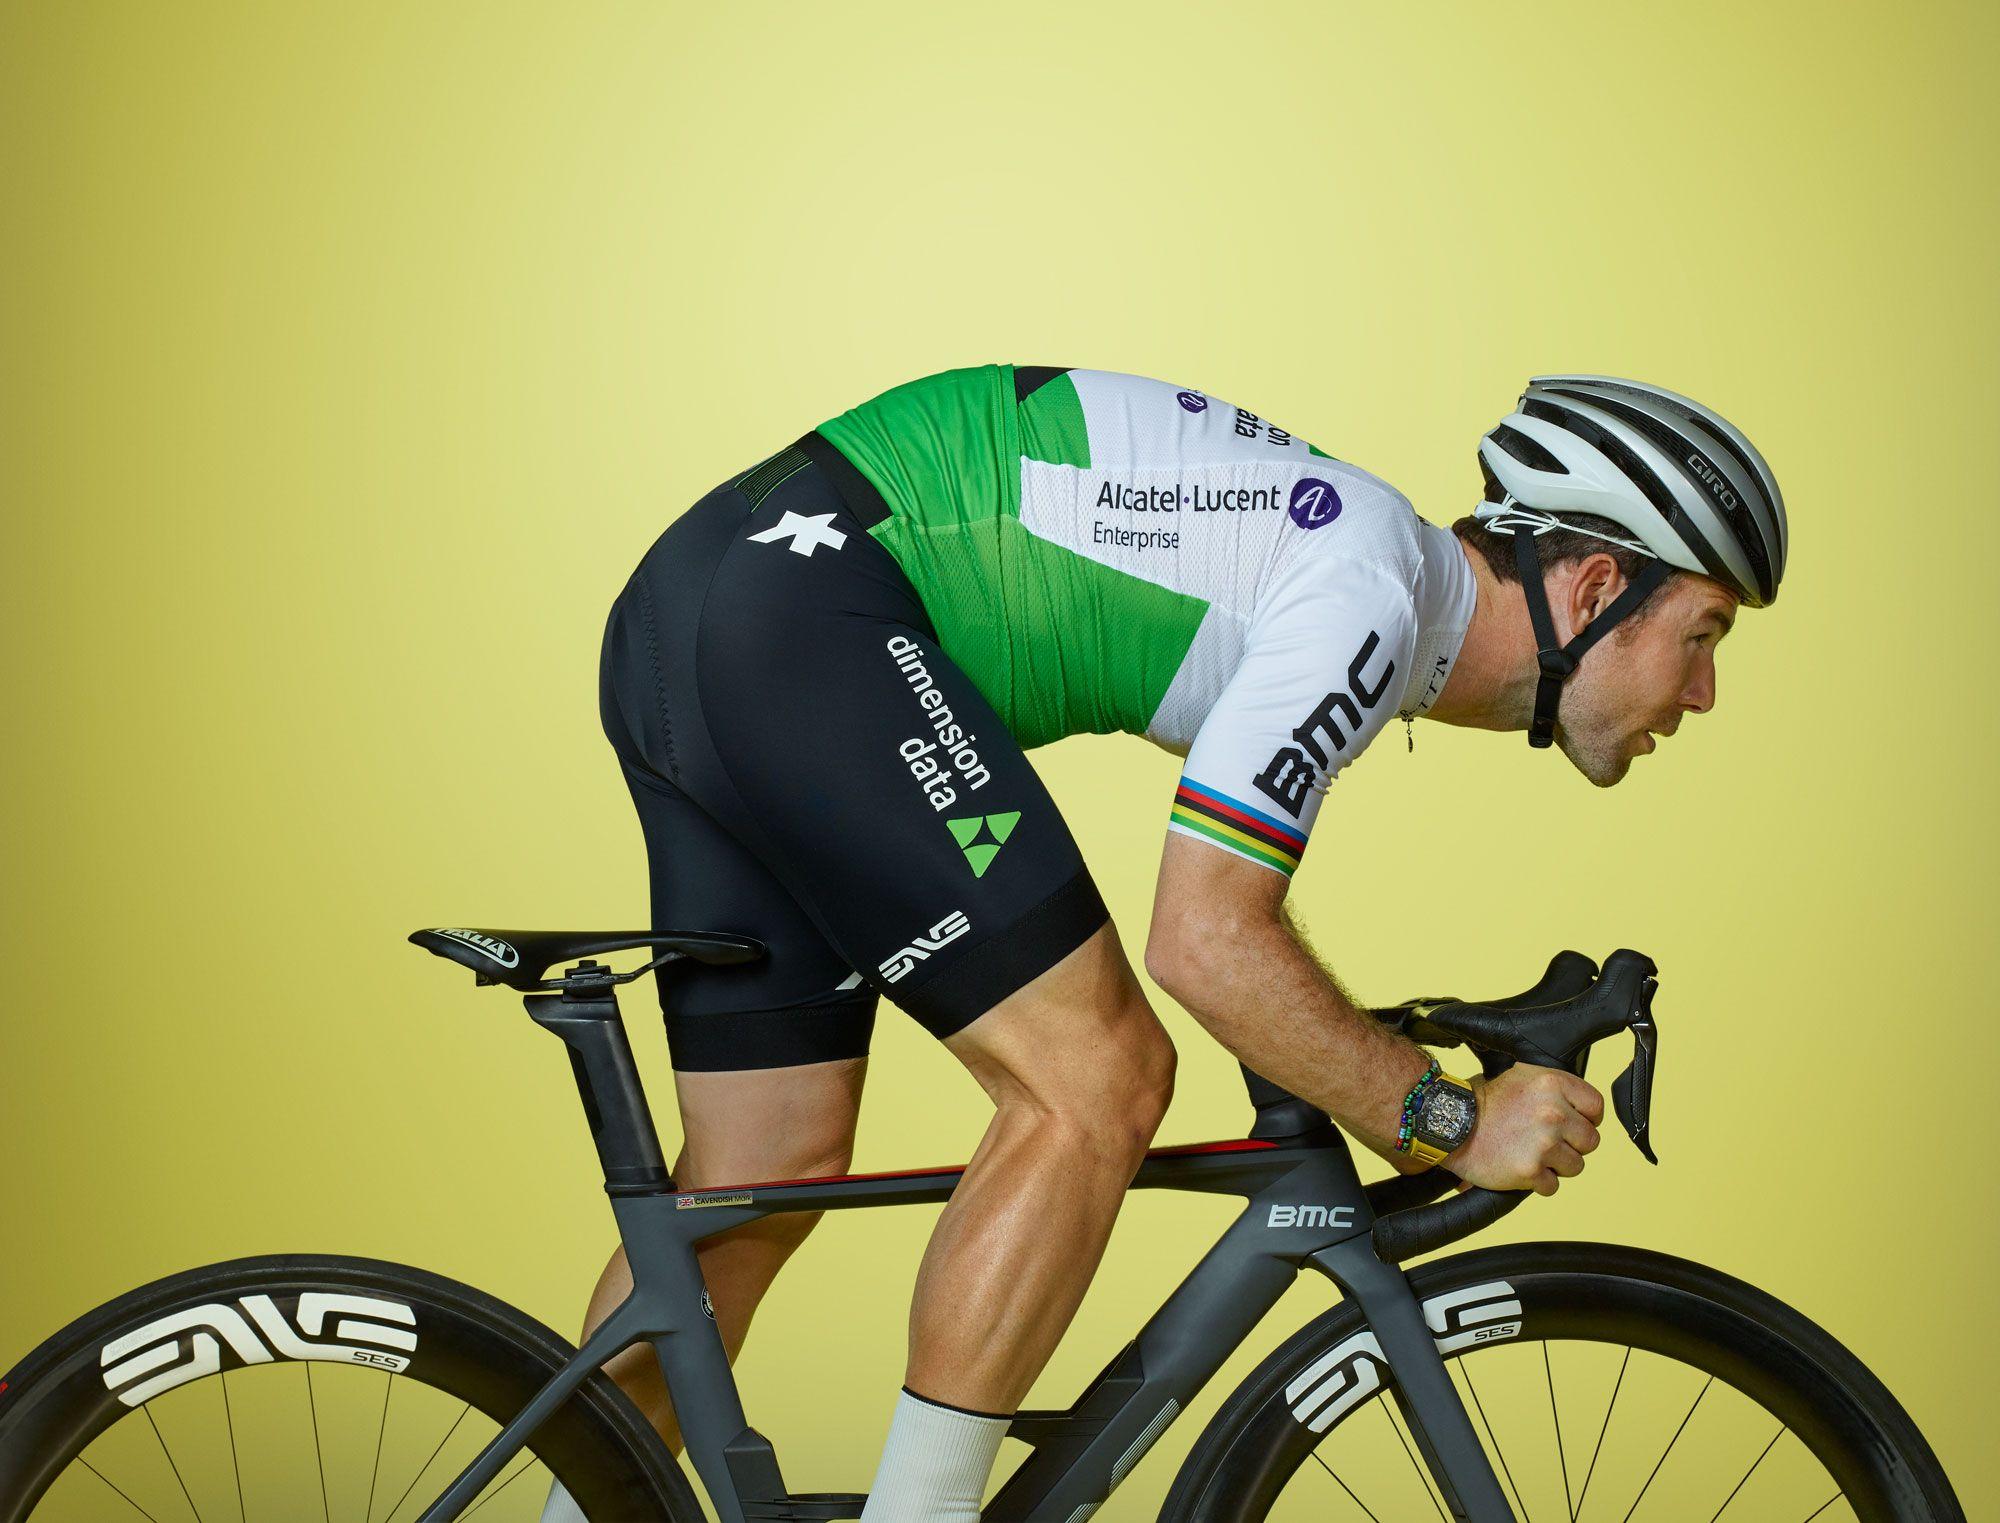 Mark Cavendish: My Training Week